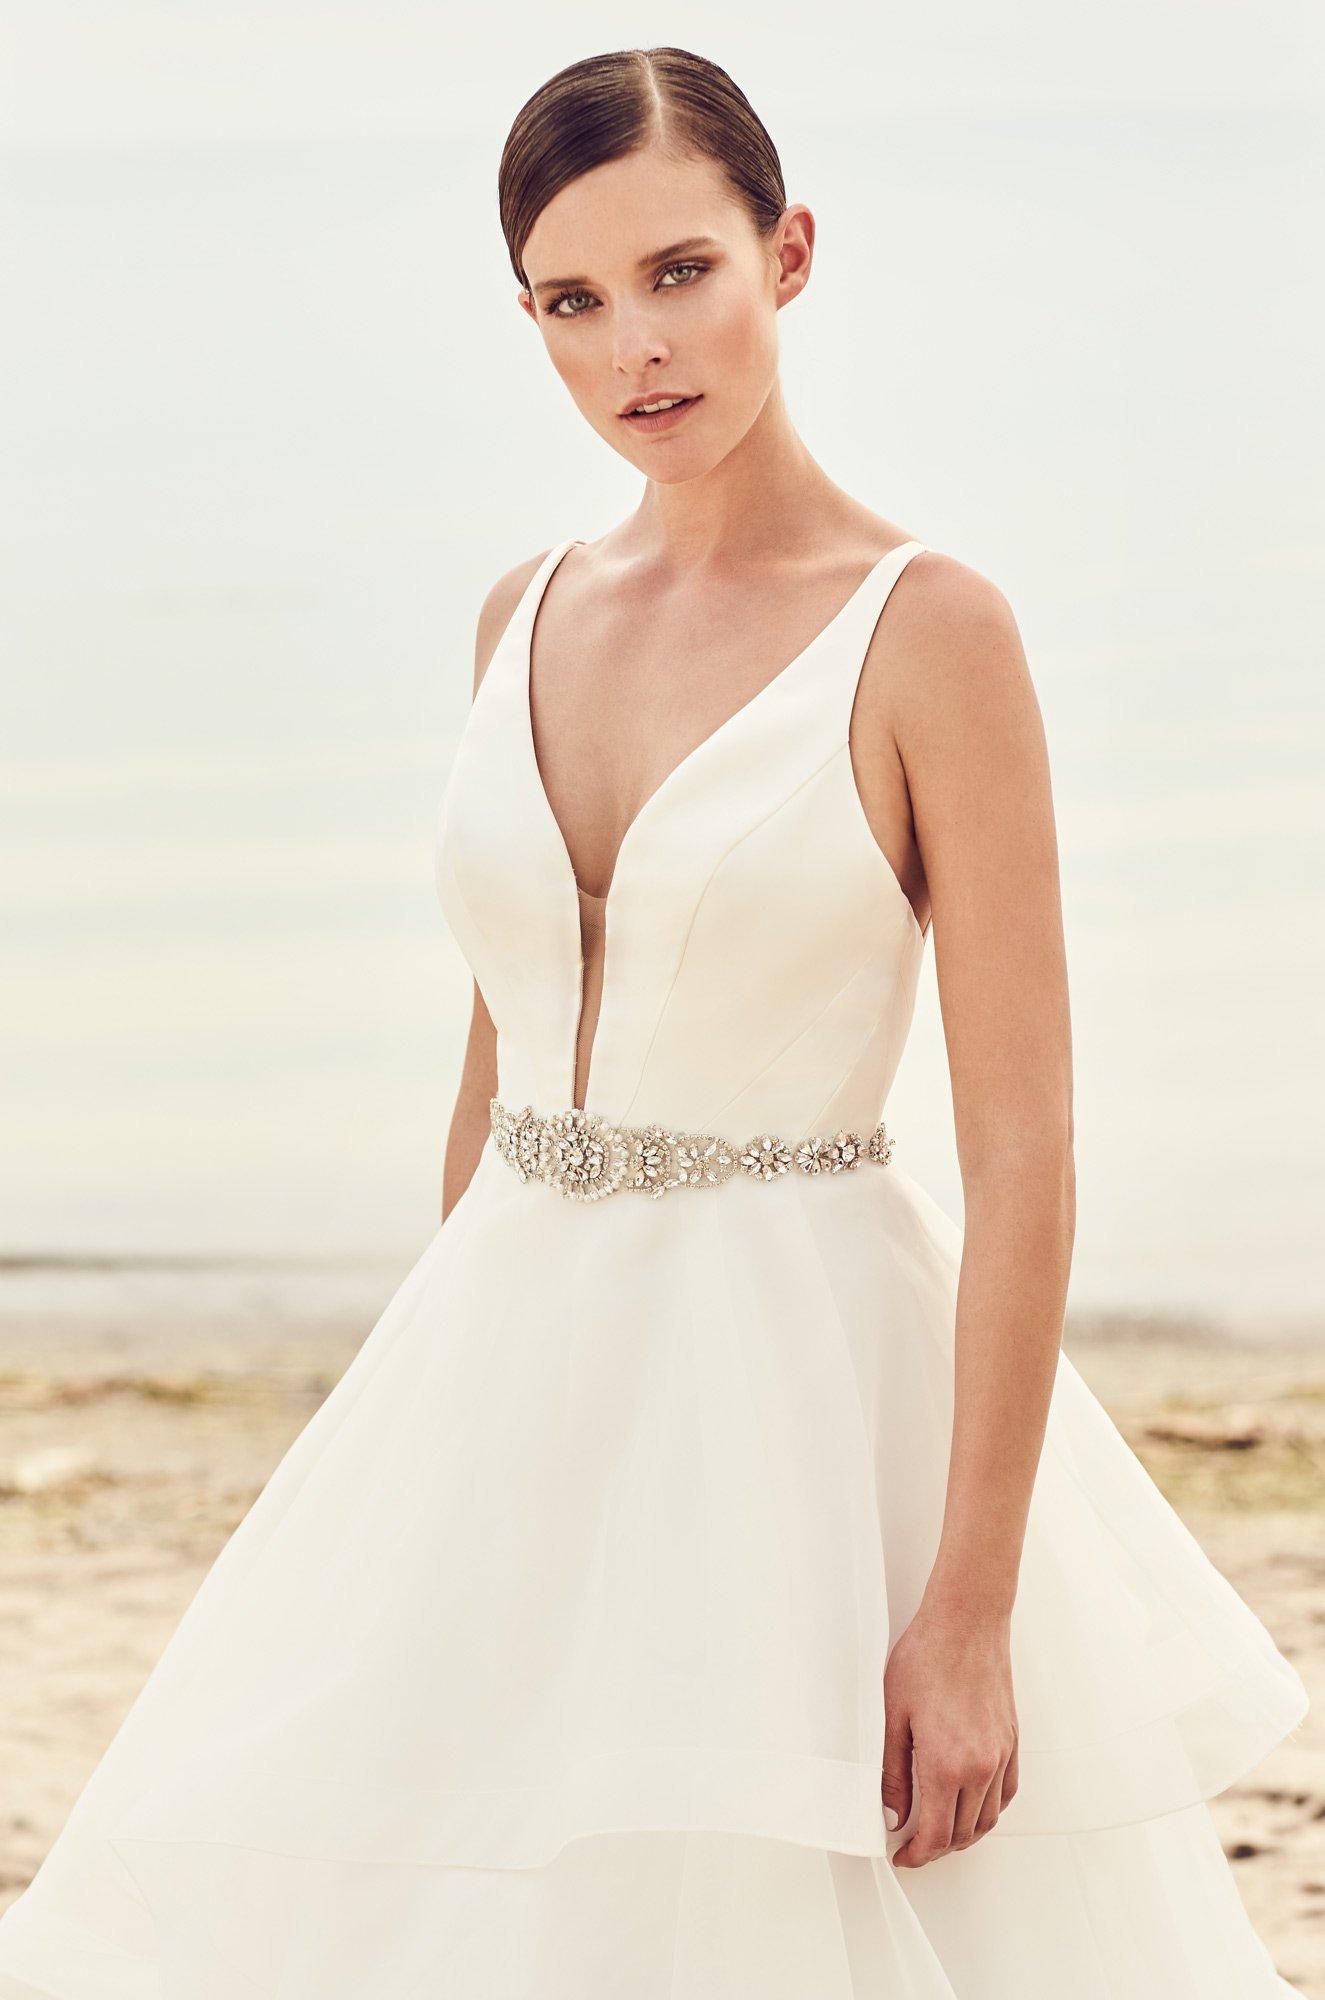 Tiered Organza Skirt Wedding Dress - Style #2112 | Mikaella Bridal